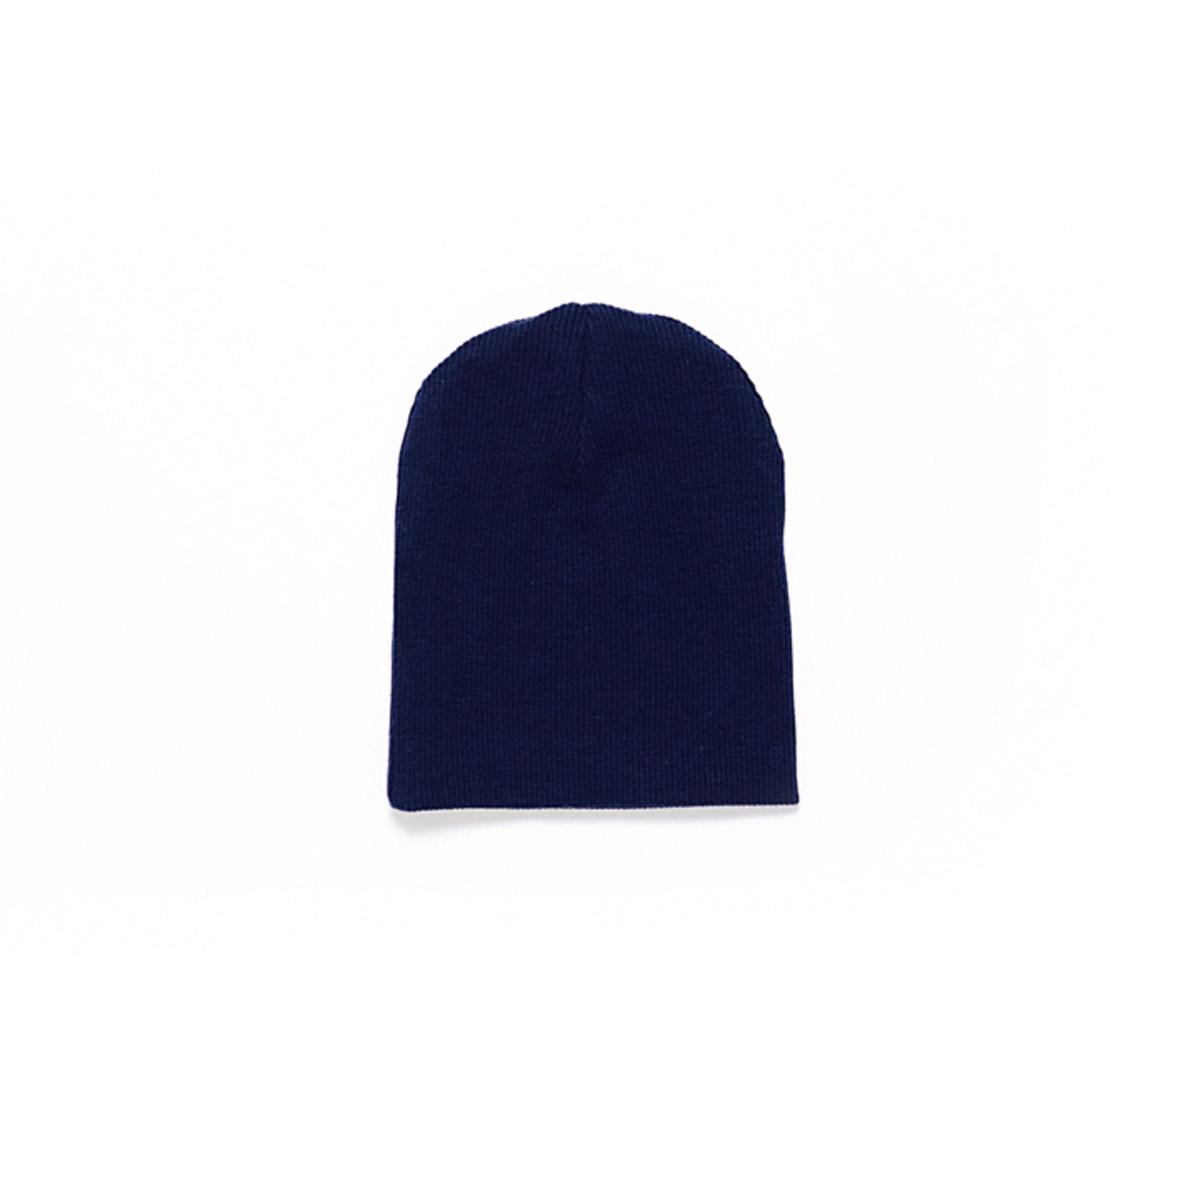 Шапочка Ёмаё (30-02) размер 38 синий